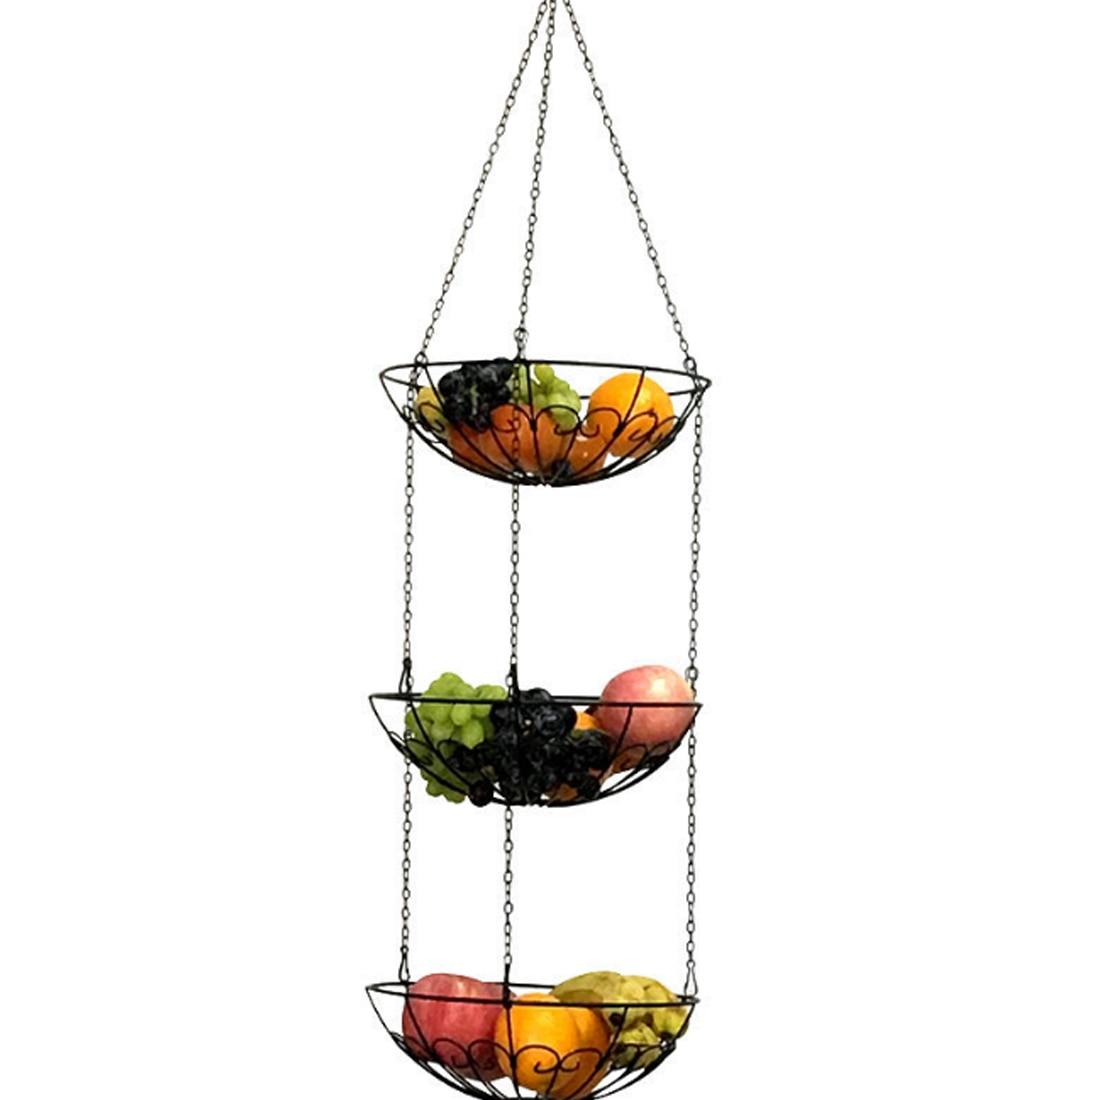 HIPSTEEN estilo europeo estante de cesta de almacenamiento s 3 niveles colgando cocina verduras fruta estante de cesta de almacenamiento con cadena de hierro gran oferta